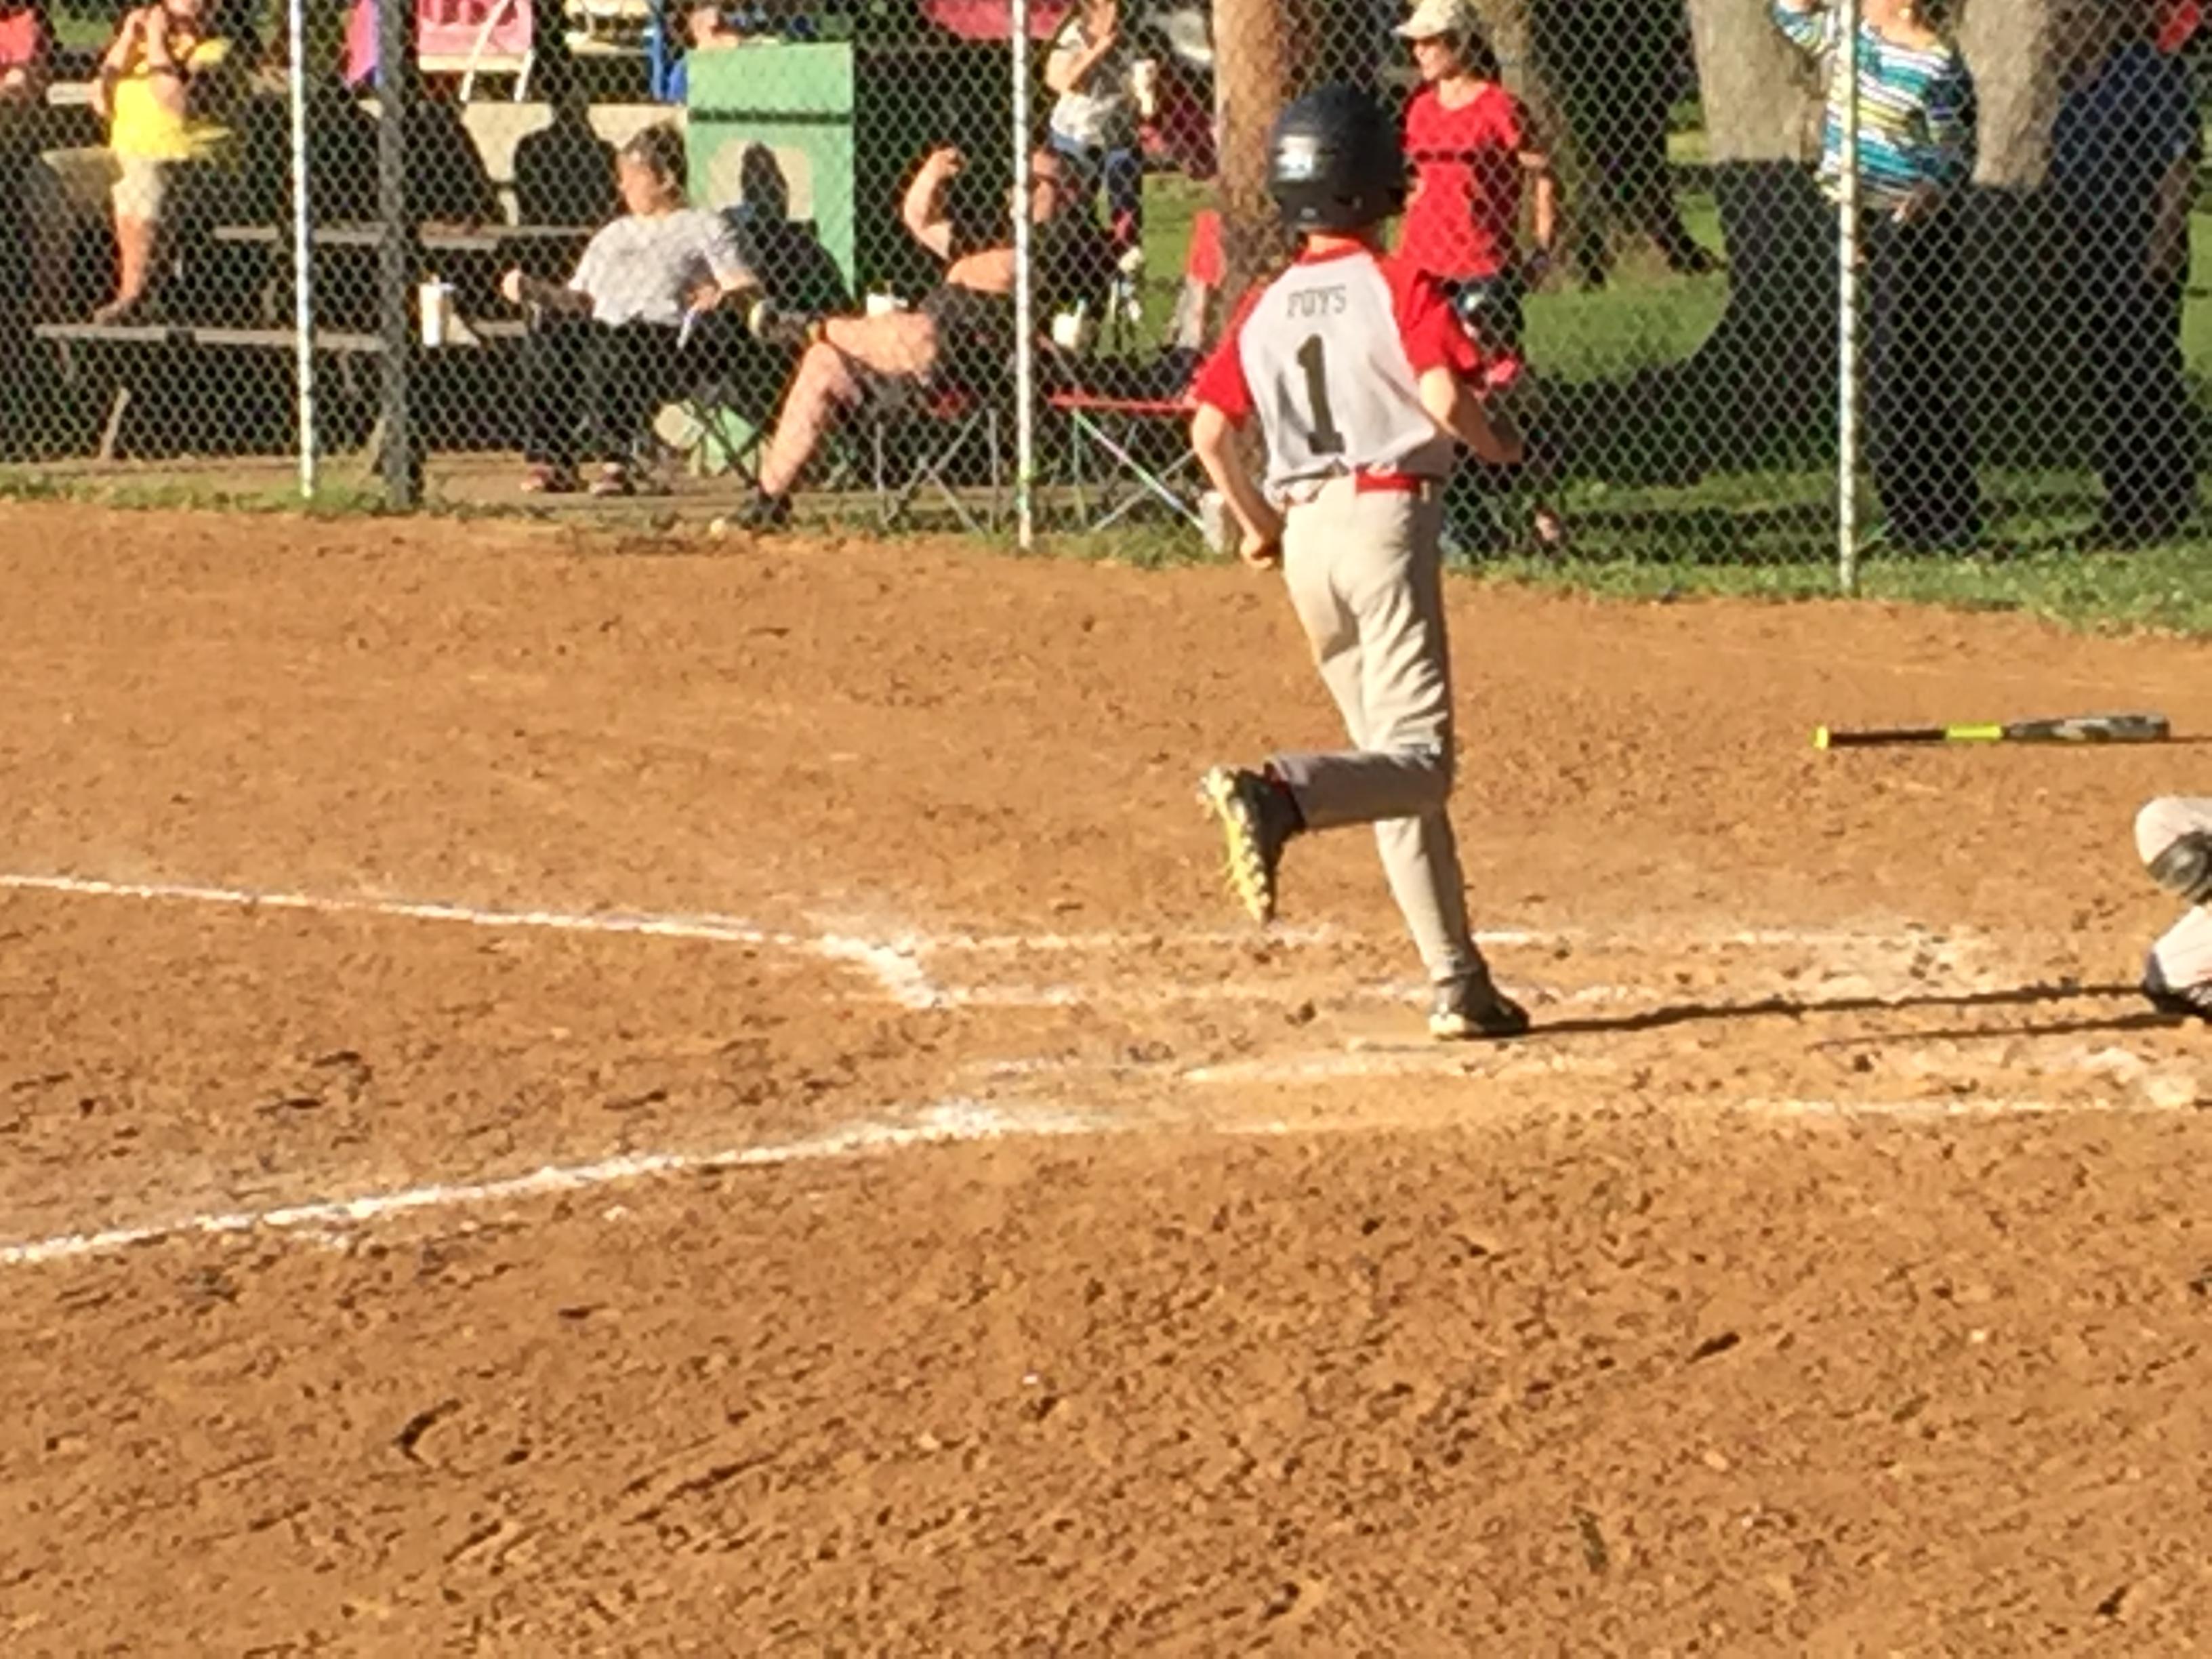 Game 8 Got Dents Vs Riverton Twins, June 7, 2016 in Springfield, IL. http://217dent.com